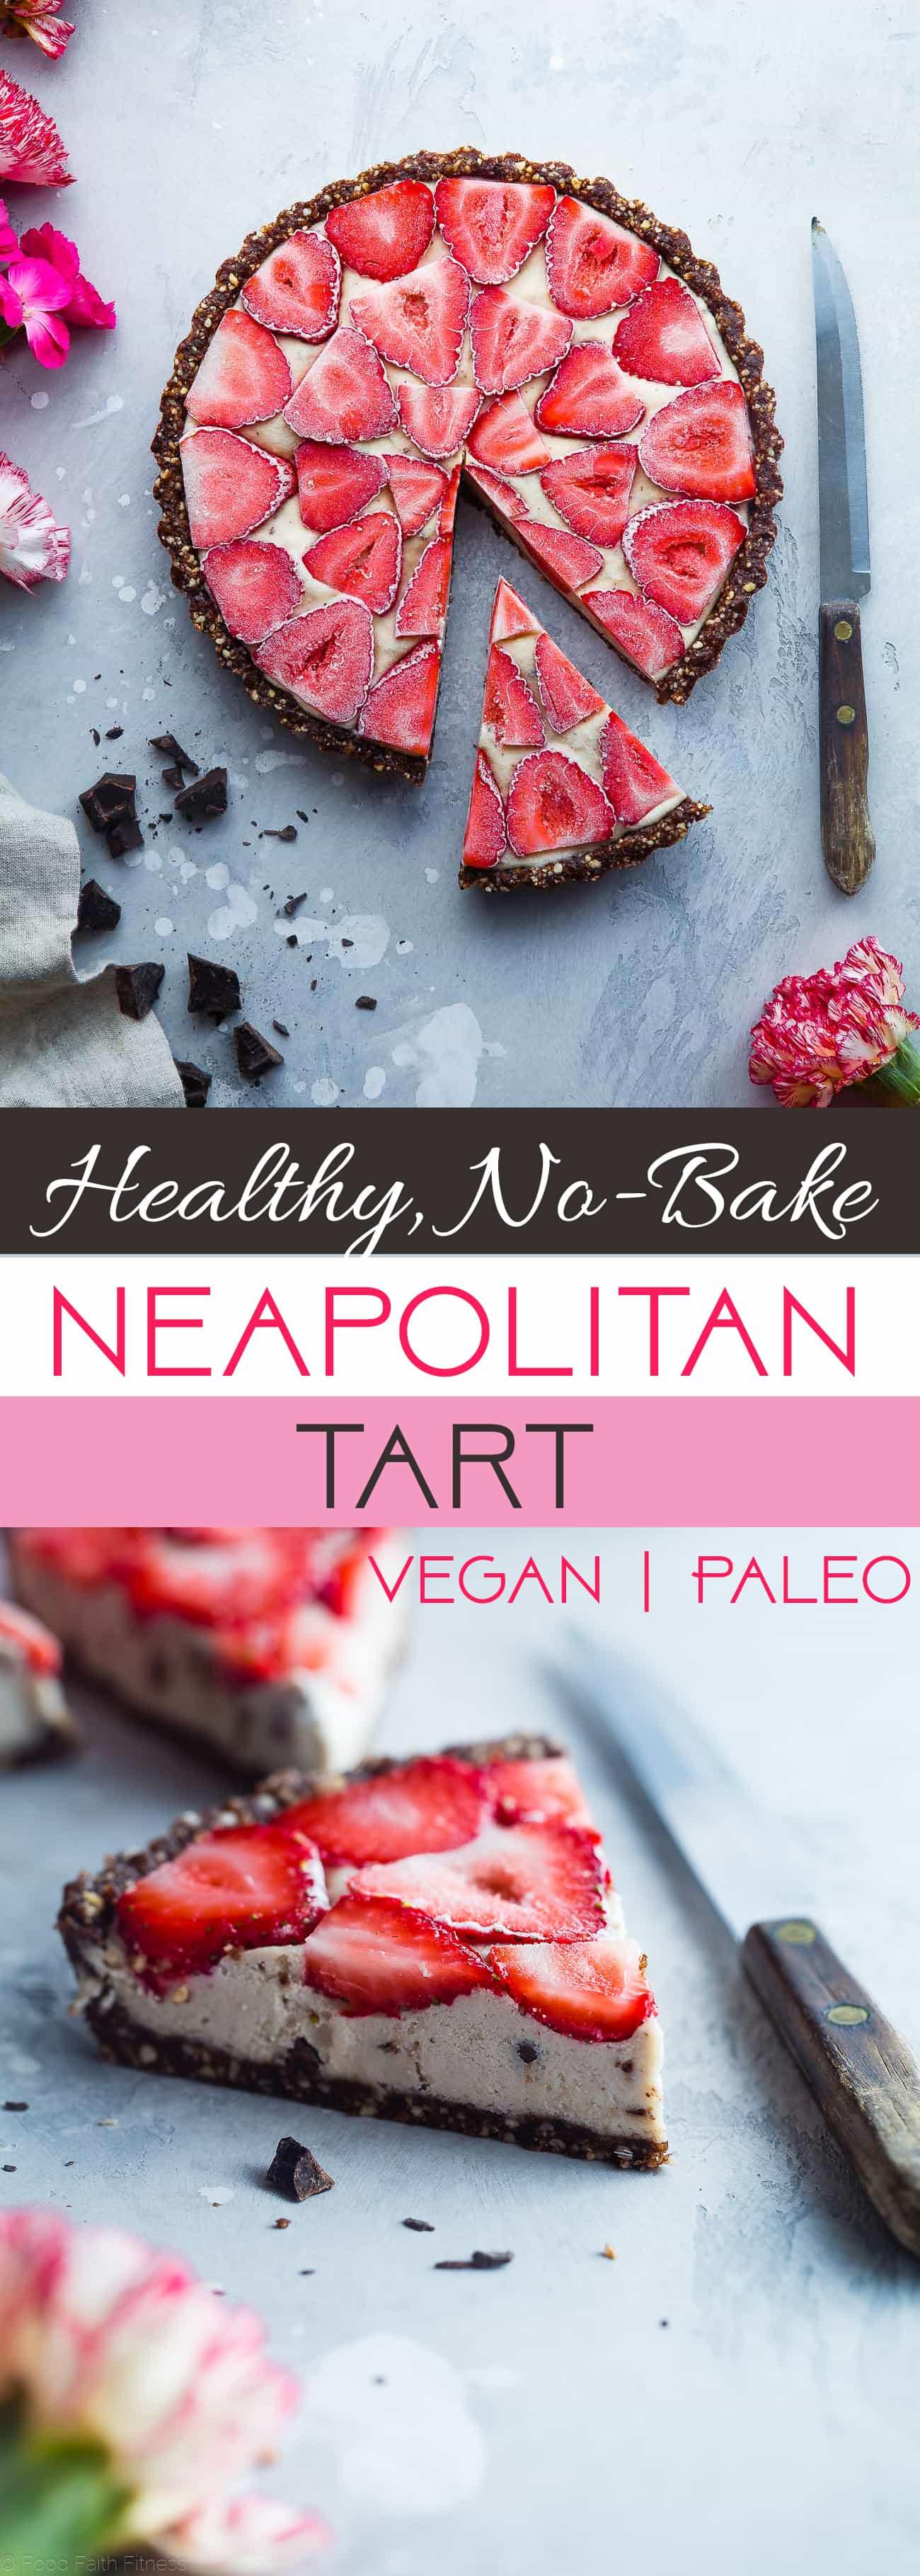 No-Bake Neapolitan Tart -This paleo friendly, no bake tart is an easy summer dessert that tastes like healthy ice cream! Gluten, grain, dairy free and vegan friendly! | Foodfaithfitness.com | @FoodFaithFit